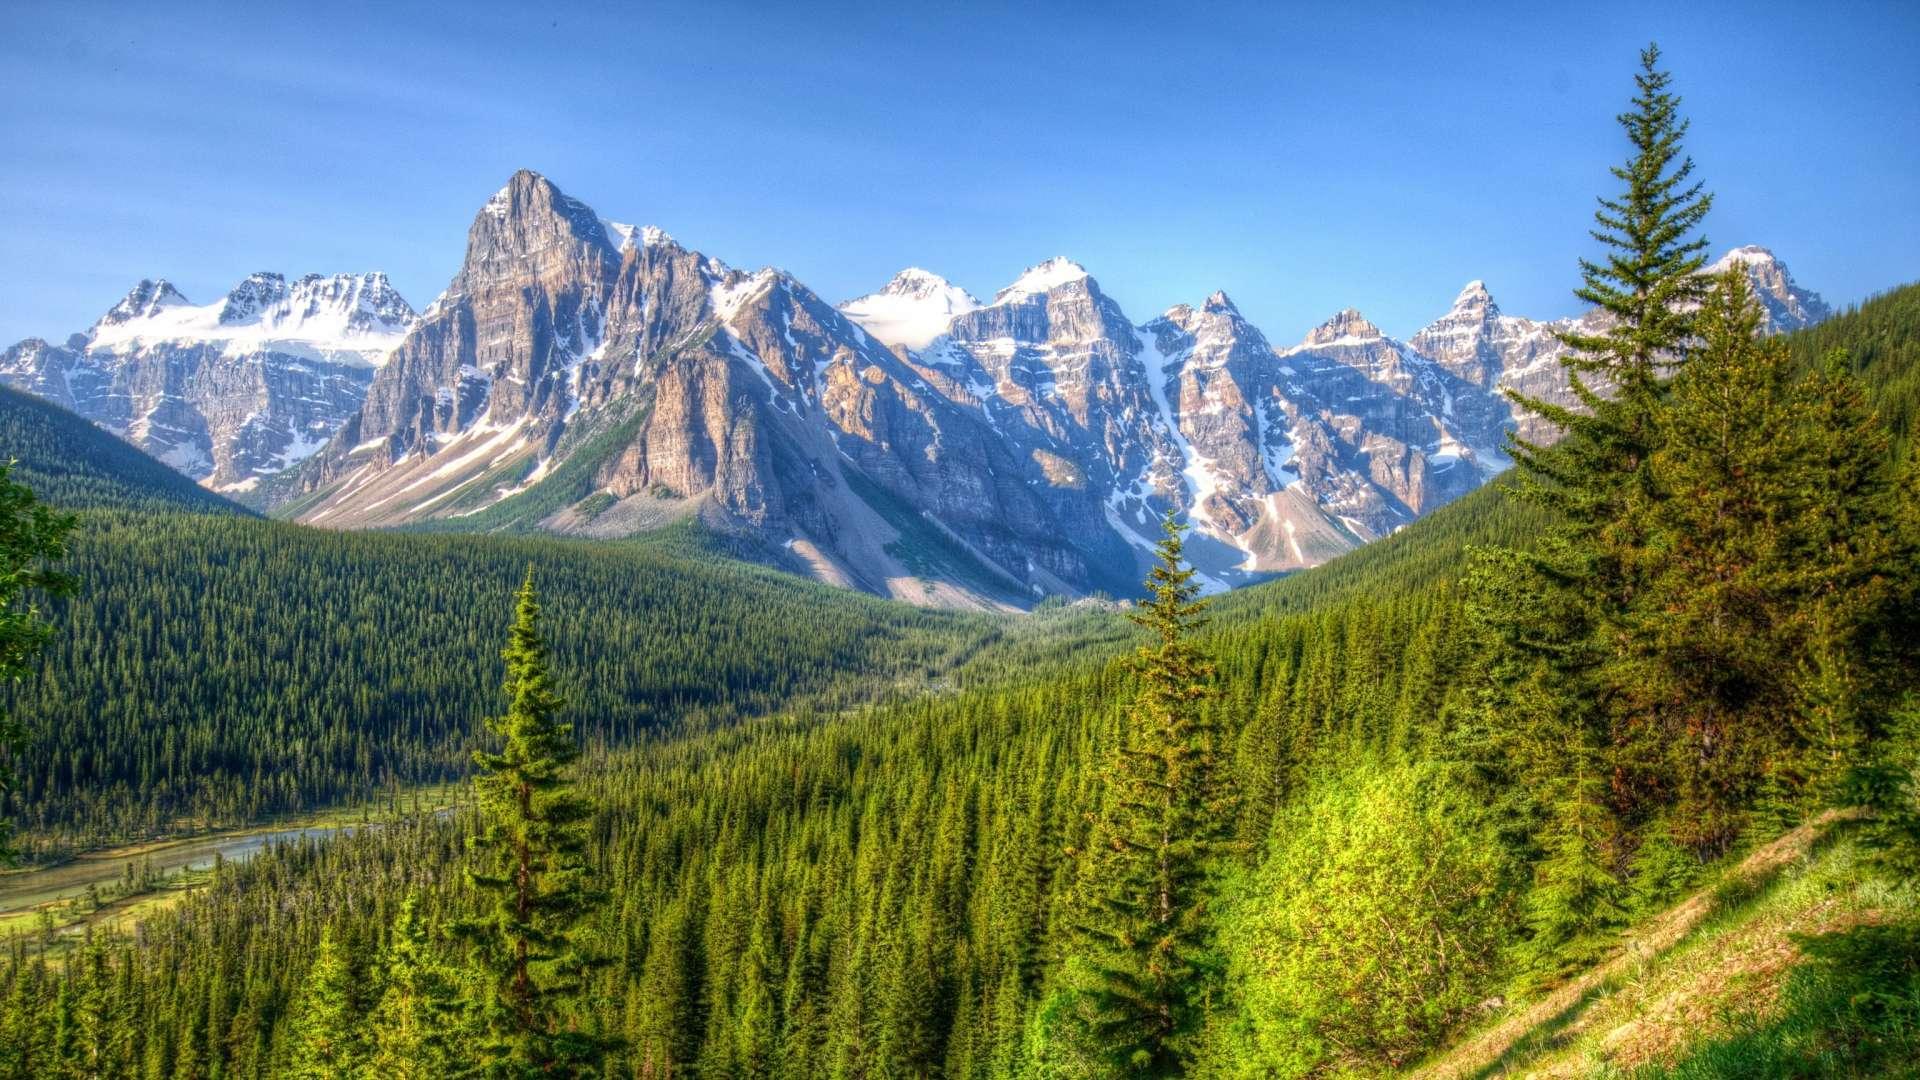 43 1080p Hd Mountain Wallpaper On Wallpapersafari